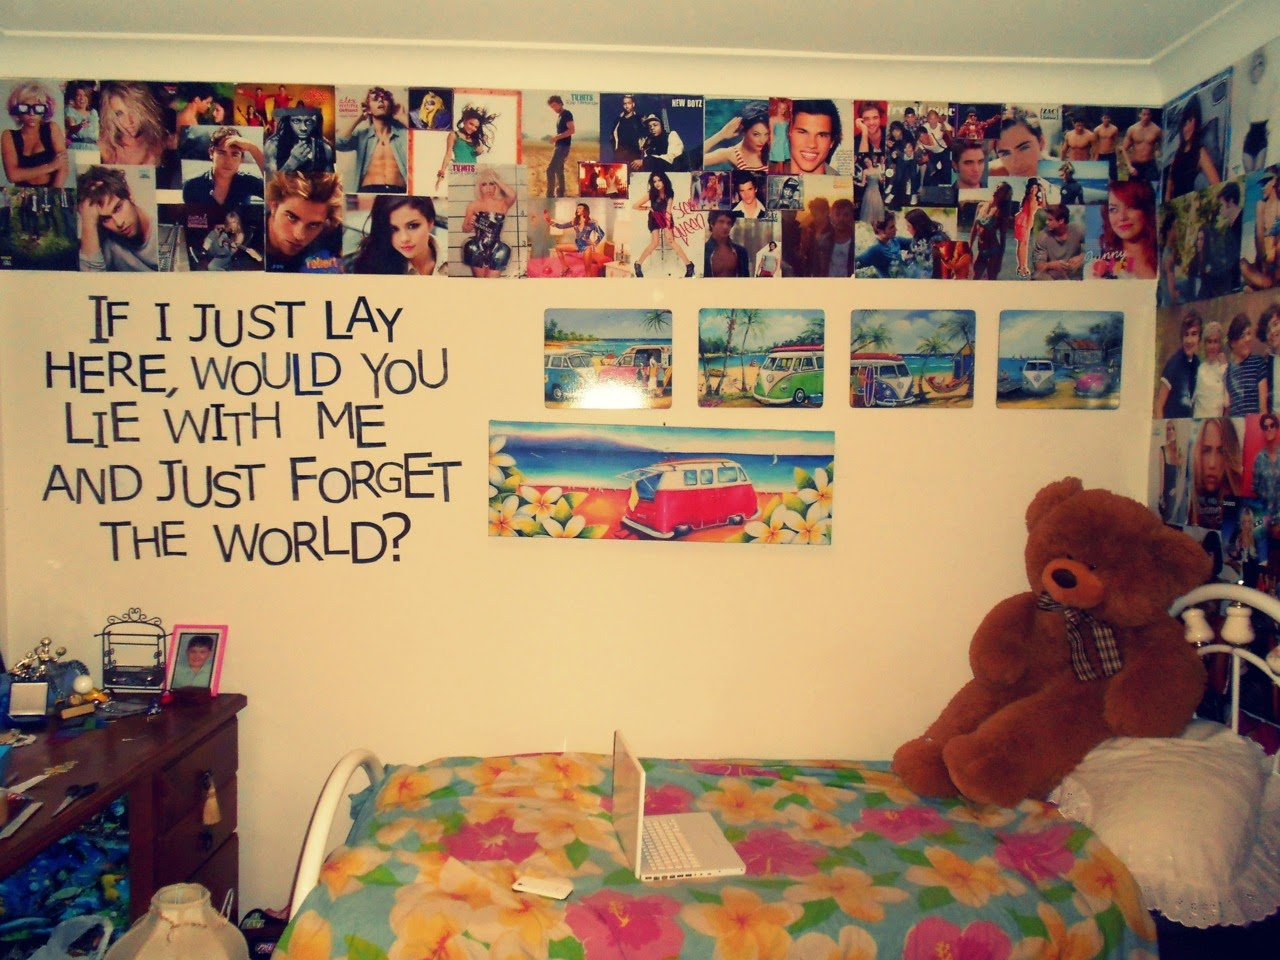 Hipster Bedroom Decorating Ideas - Elitflat